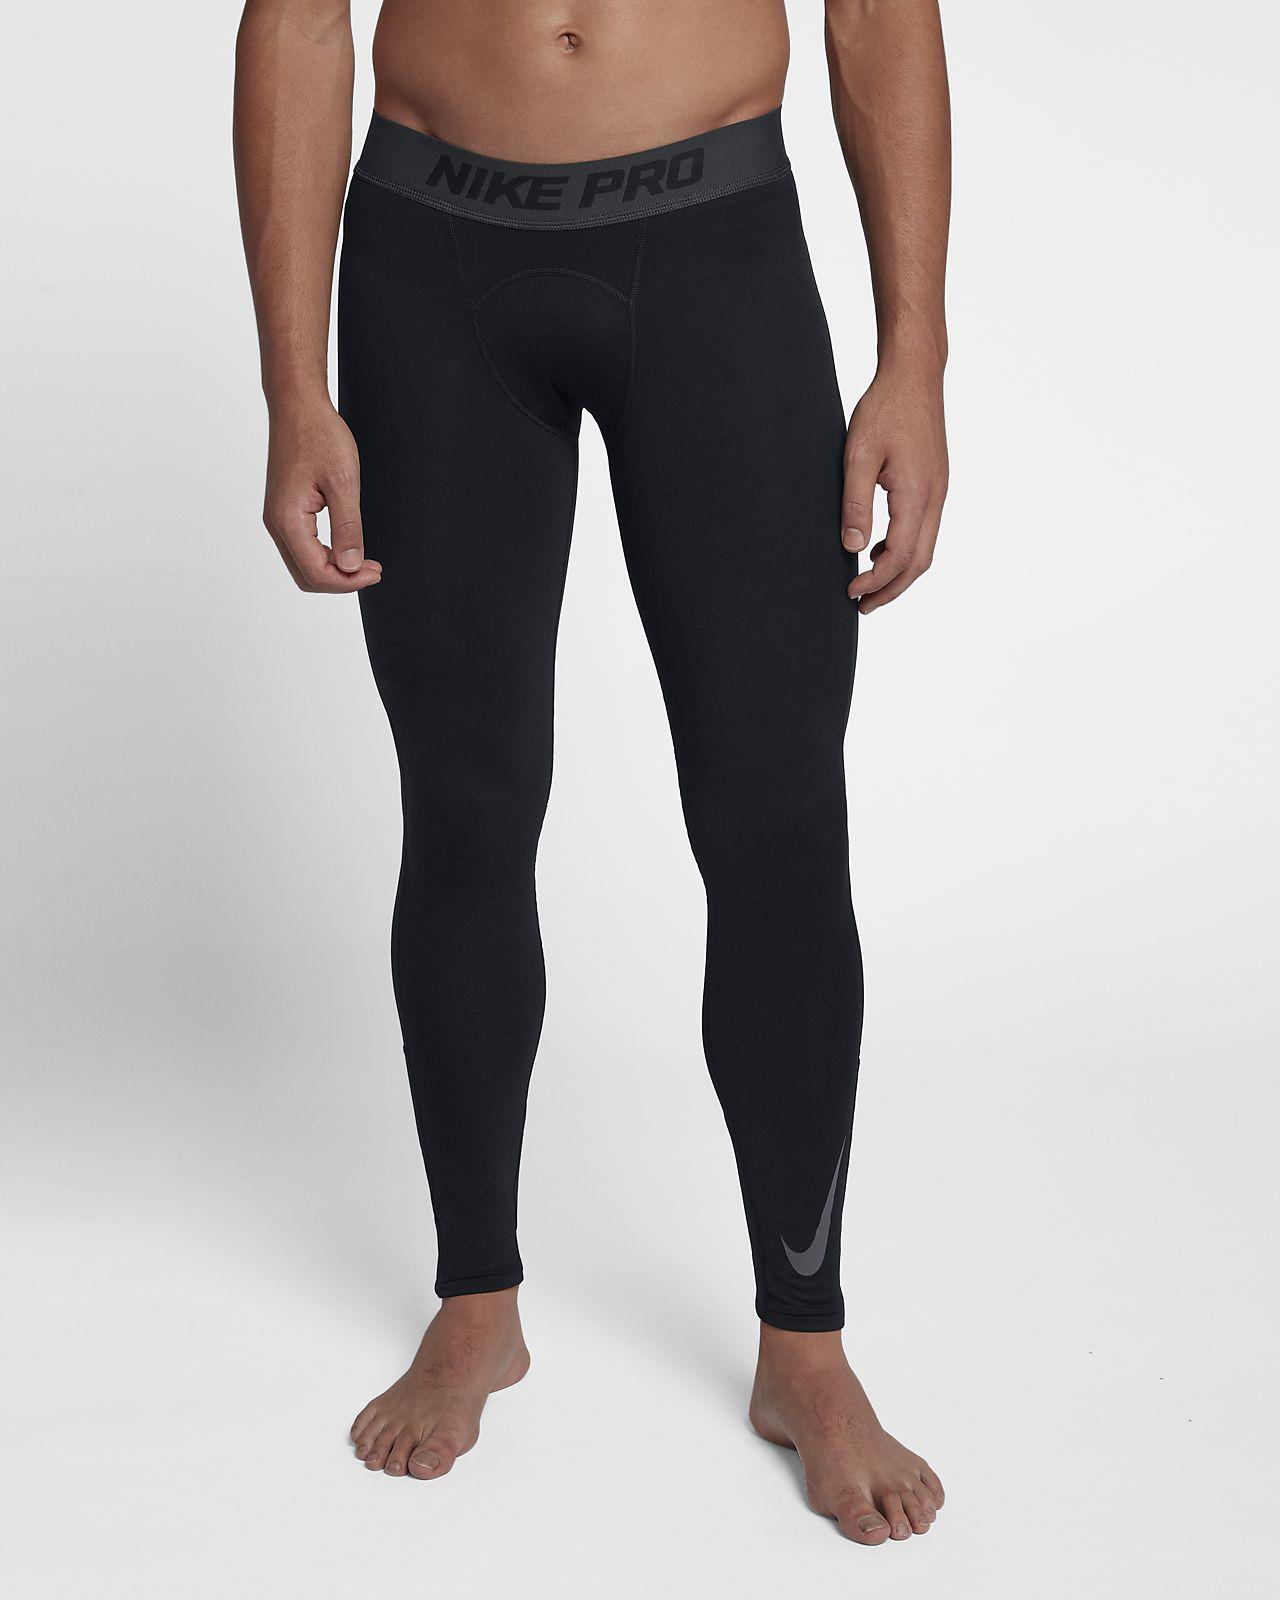 Leggings Nike Uomo | Tights Pro Core Grigio » BrekMagazine